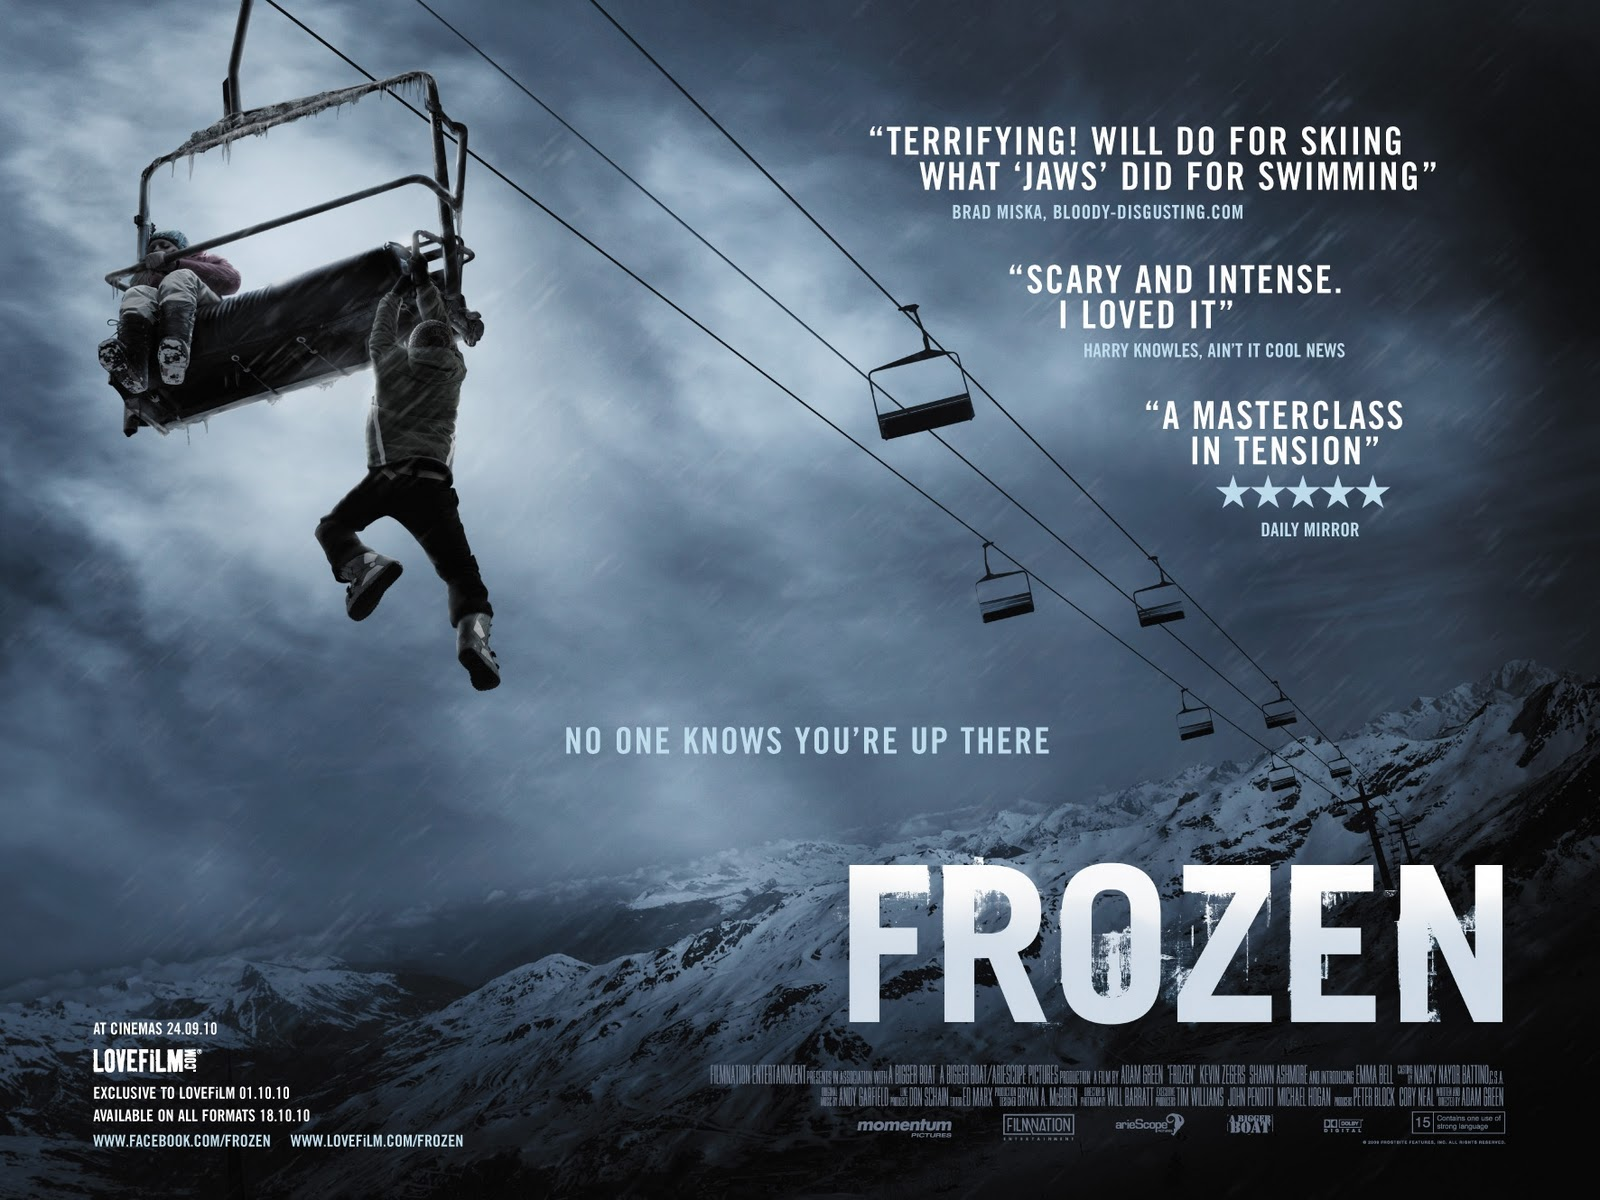 Frozen: Frozen